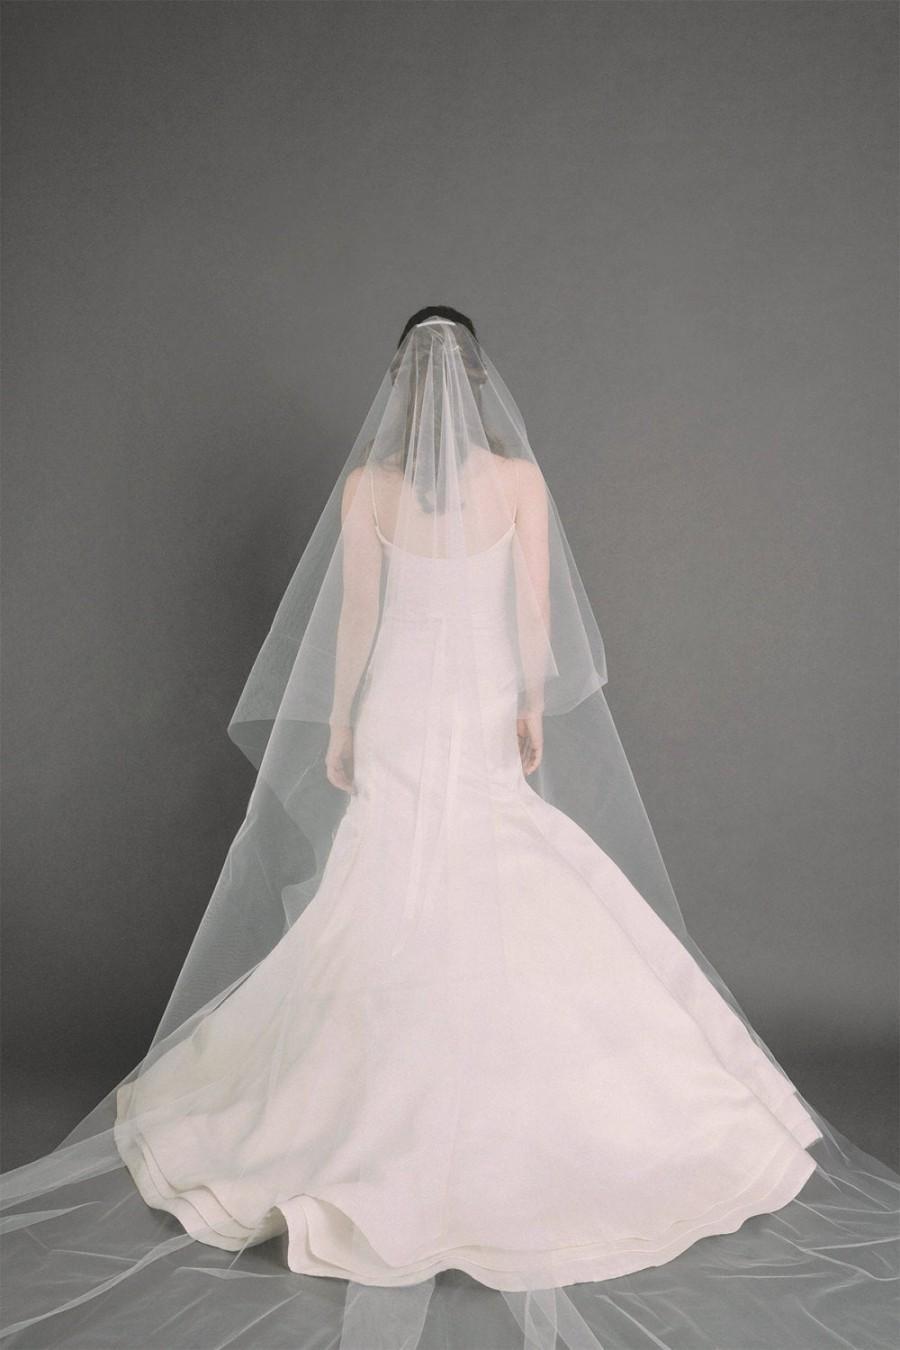 Mariage - W.J. Veil - Cathedral Length Drop Veil, Bridal Veil, Wedding Veil, Long Veil, Circle Veil, Ivory Veil, Romantic Veil, Kate Middleton Veil